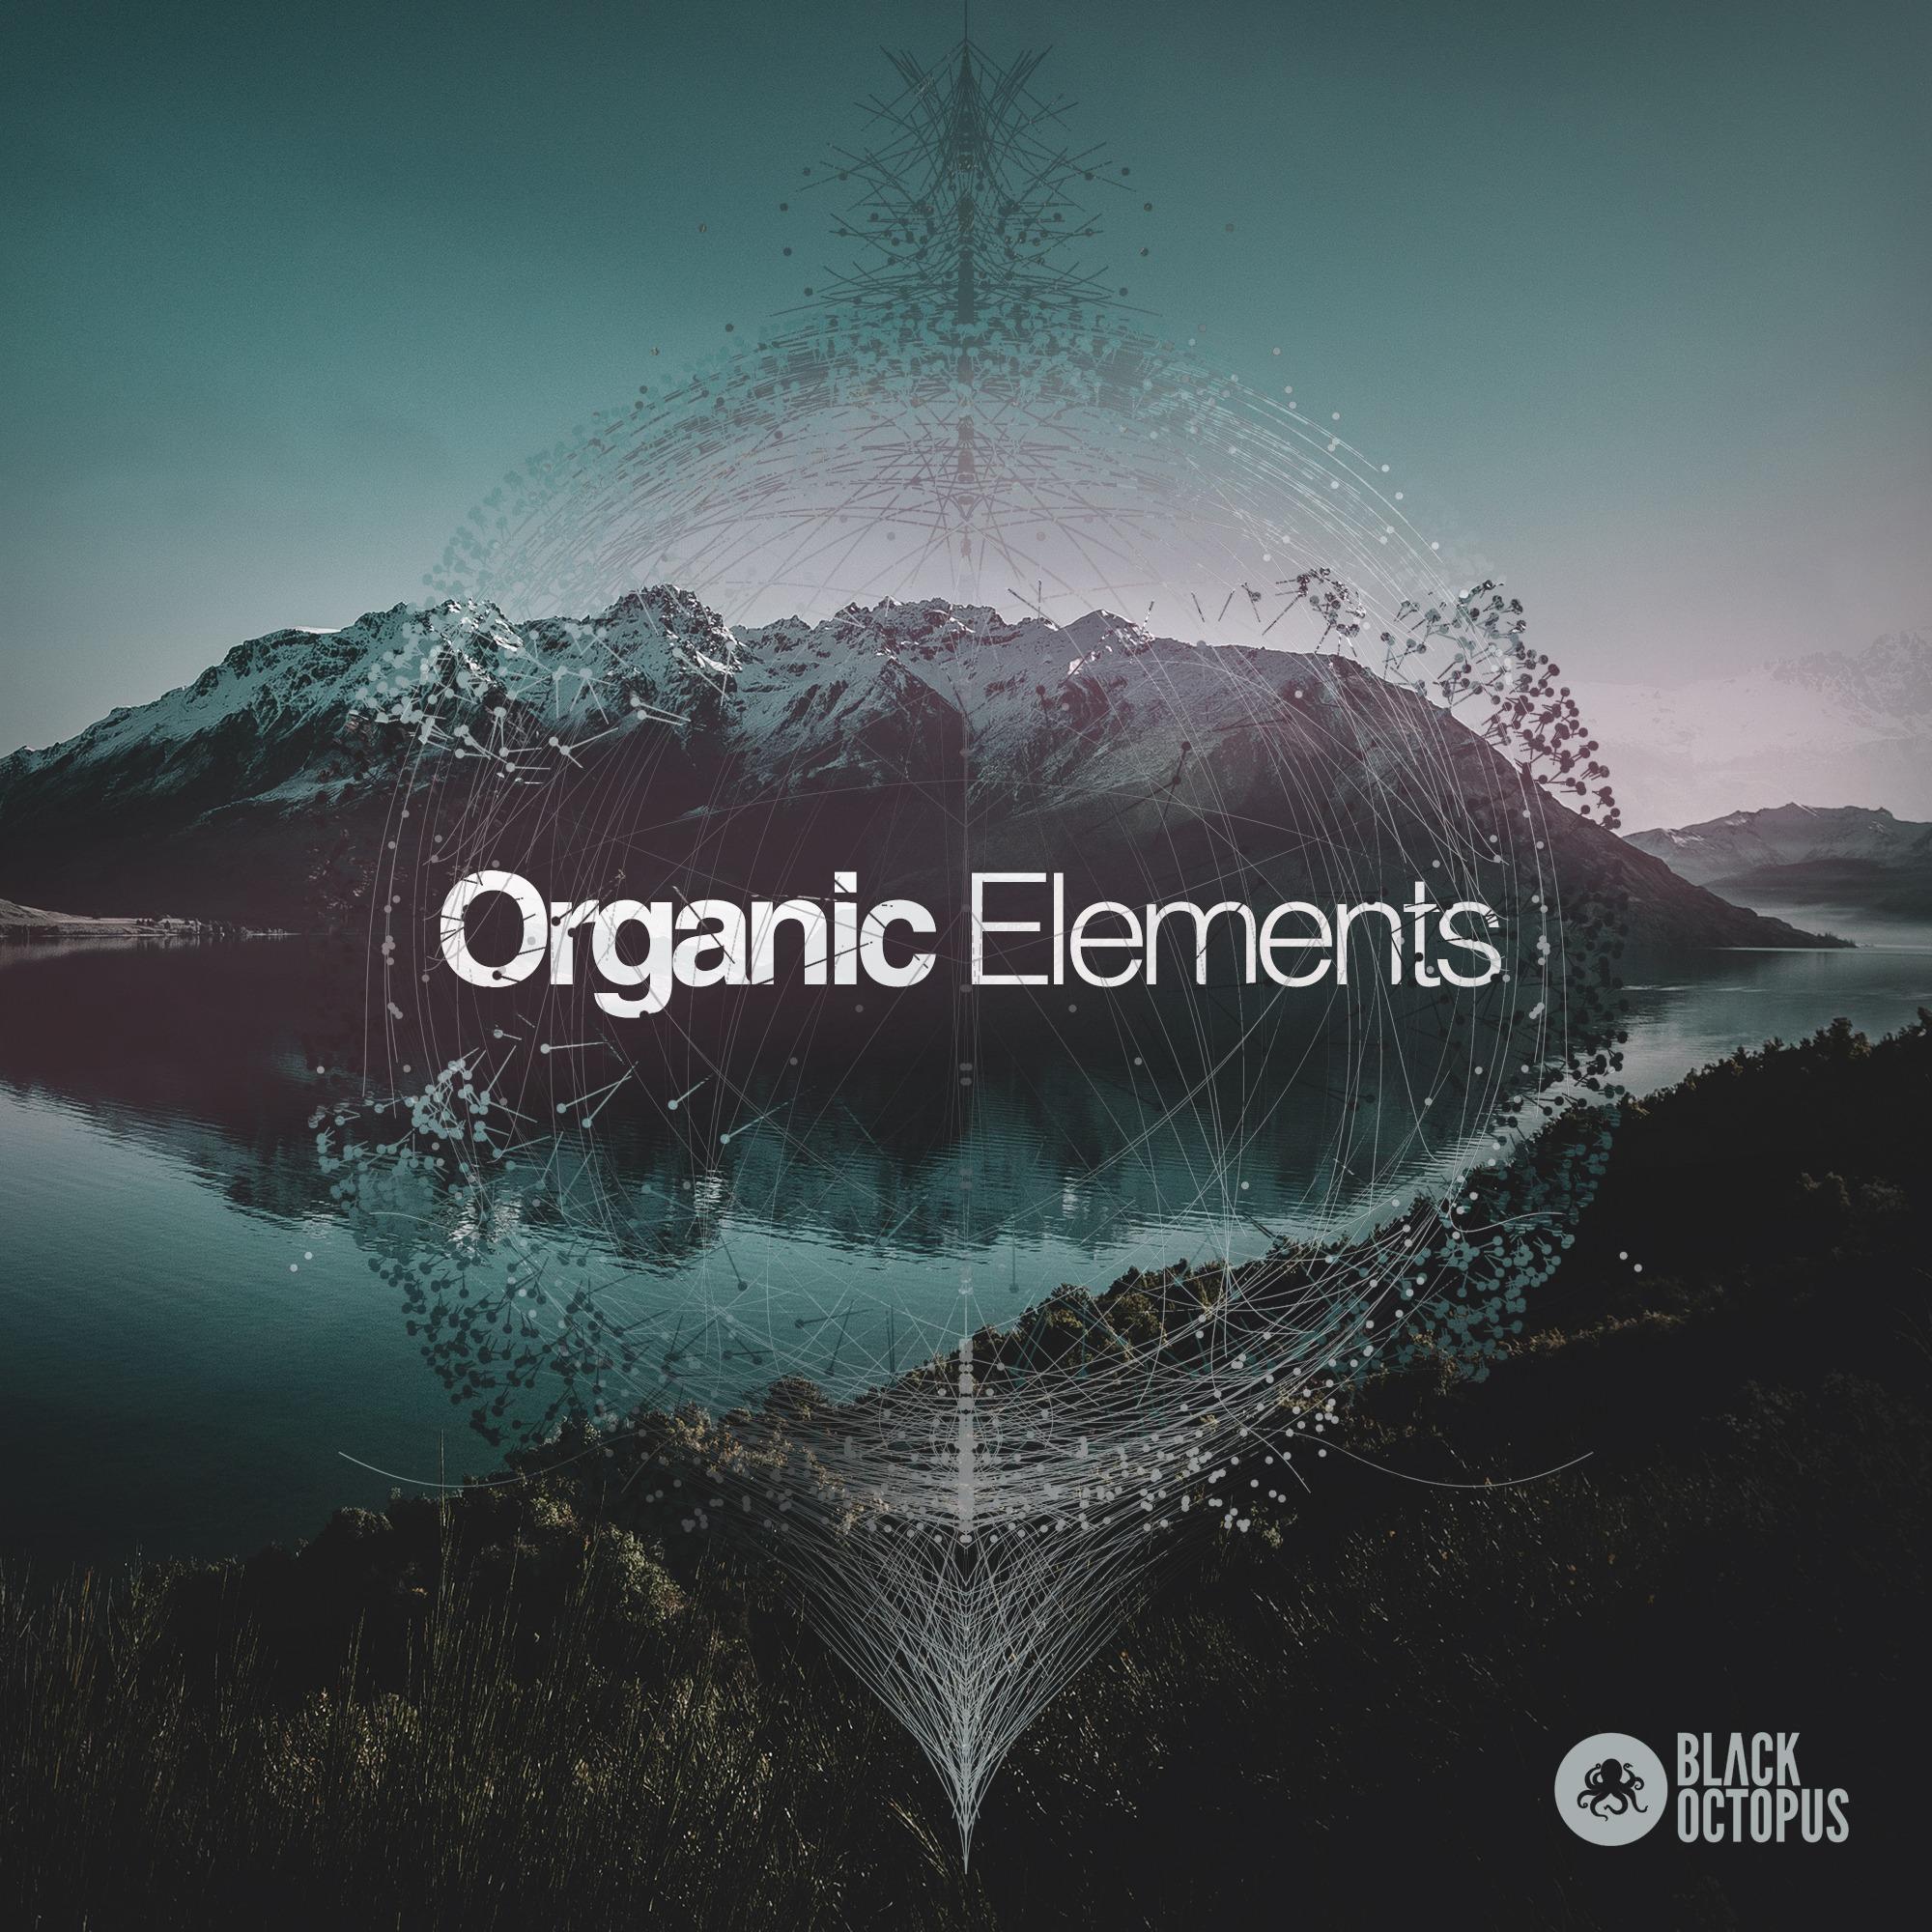 Organic Elements - Black Octopus Sound sample packs